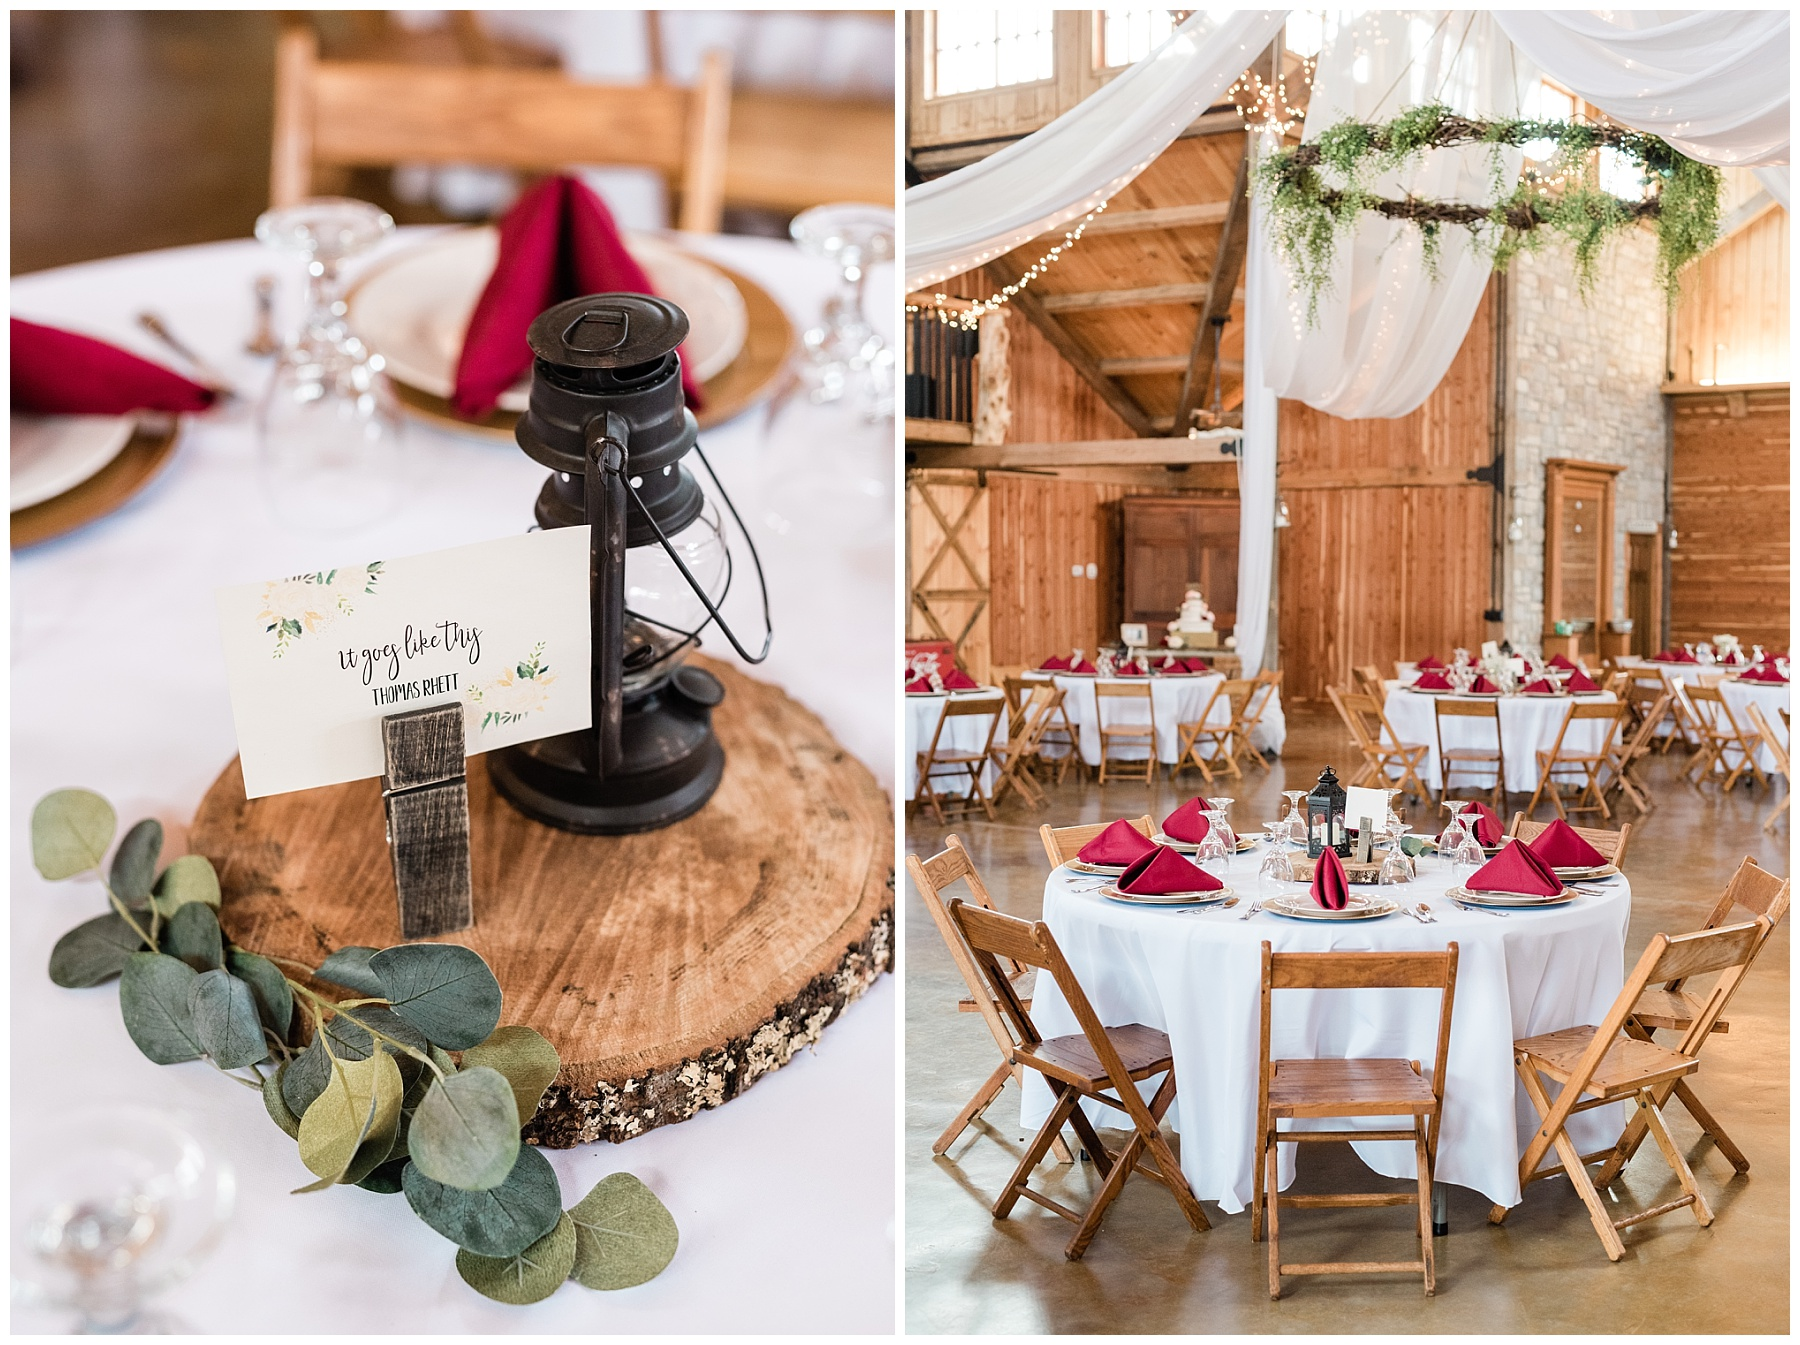 Lakeside Wedding in Fall at Mighty Oak Lodge by Misouri Wedding Photographer Kelsi Kliethermes Photography_0031.jpg